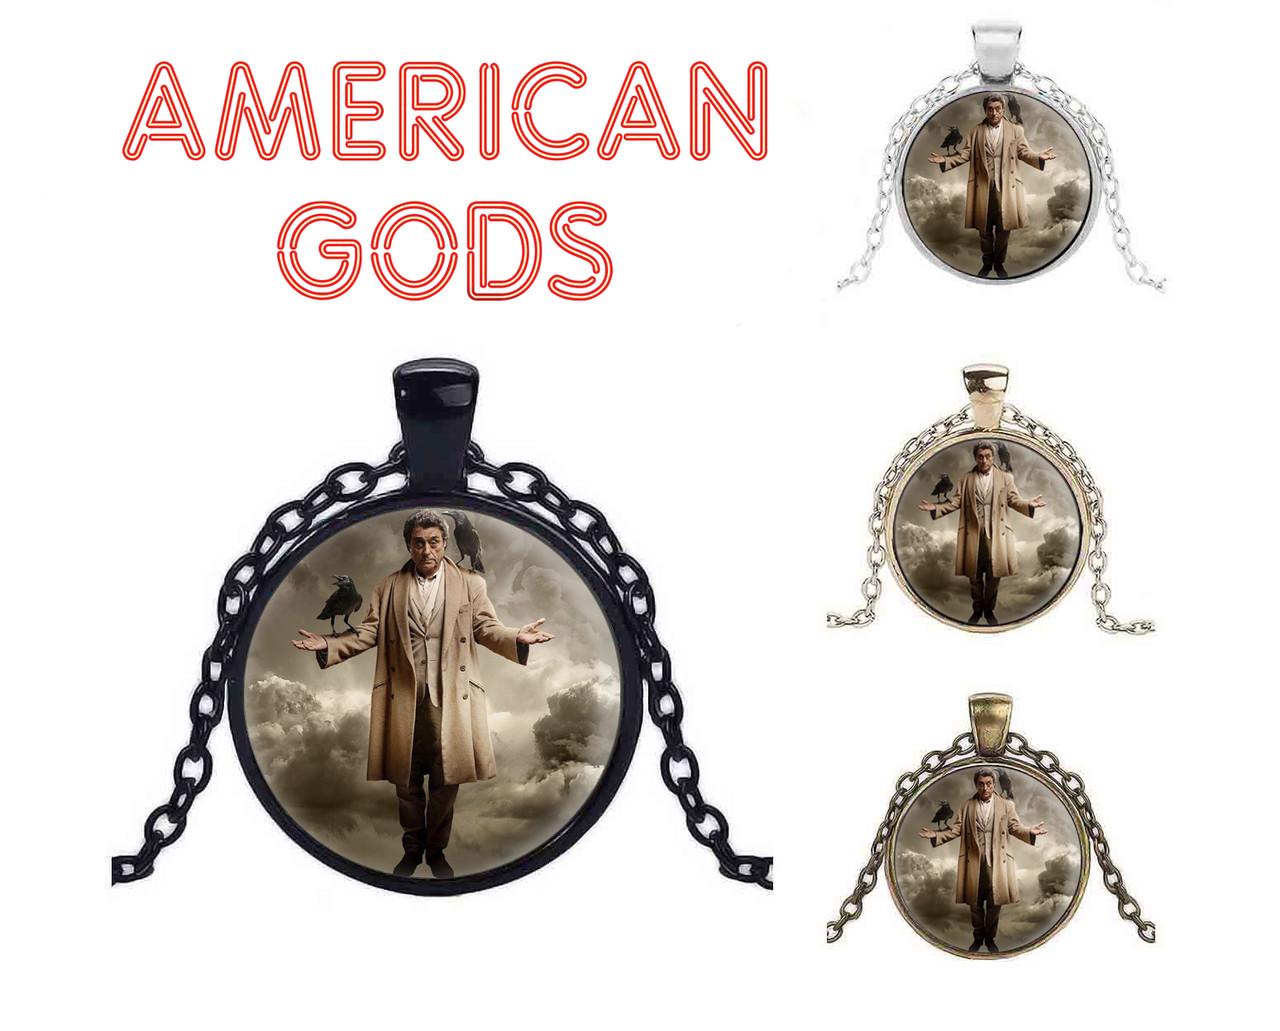 Кулон Американские боги / American Gods с Одином